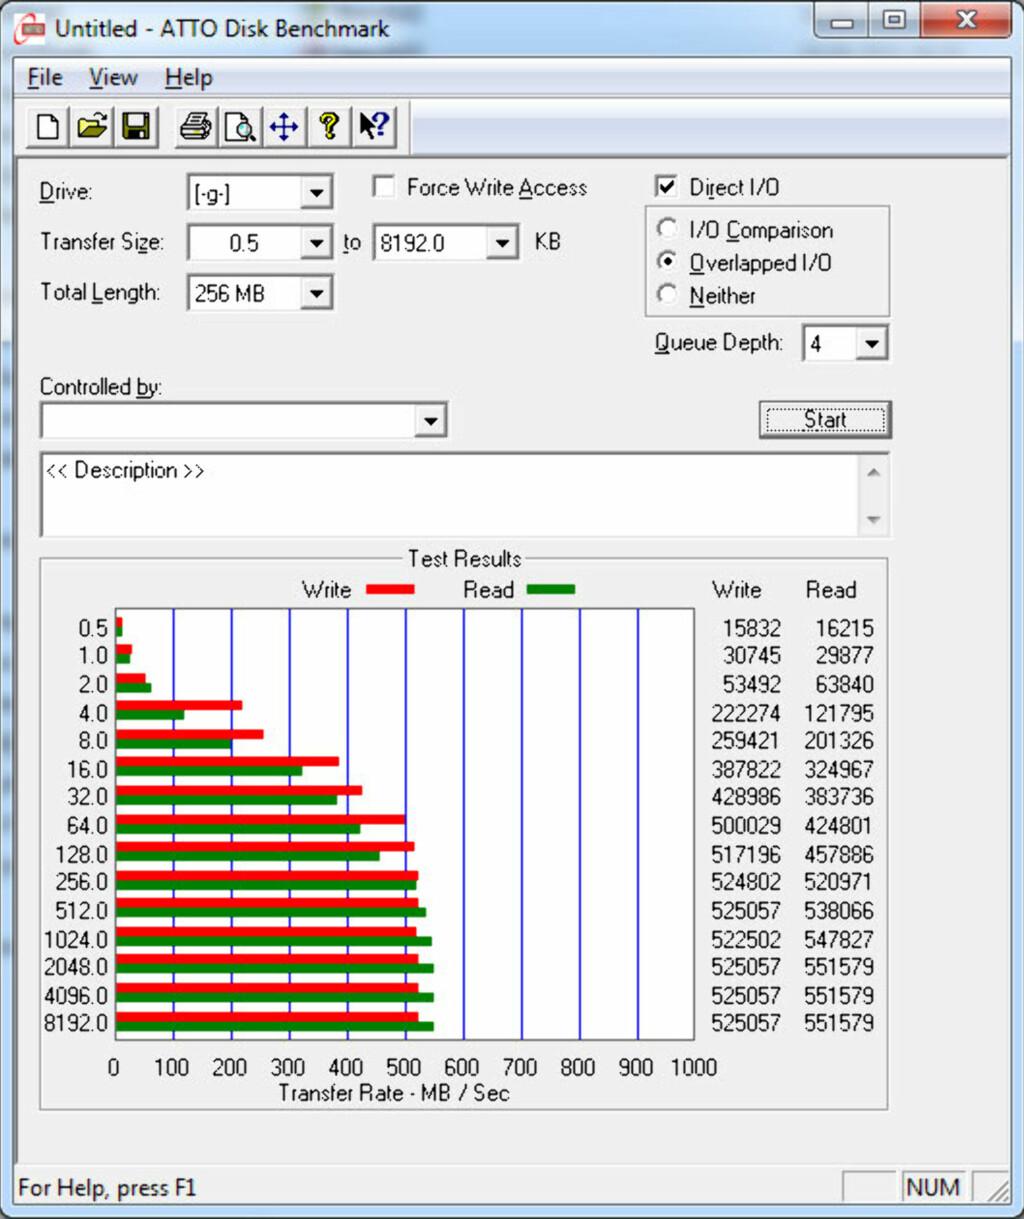 image: OCZ Vertex 3.20